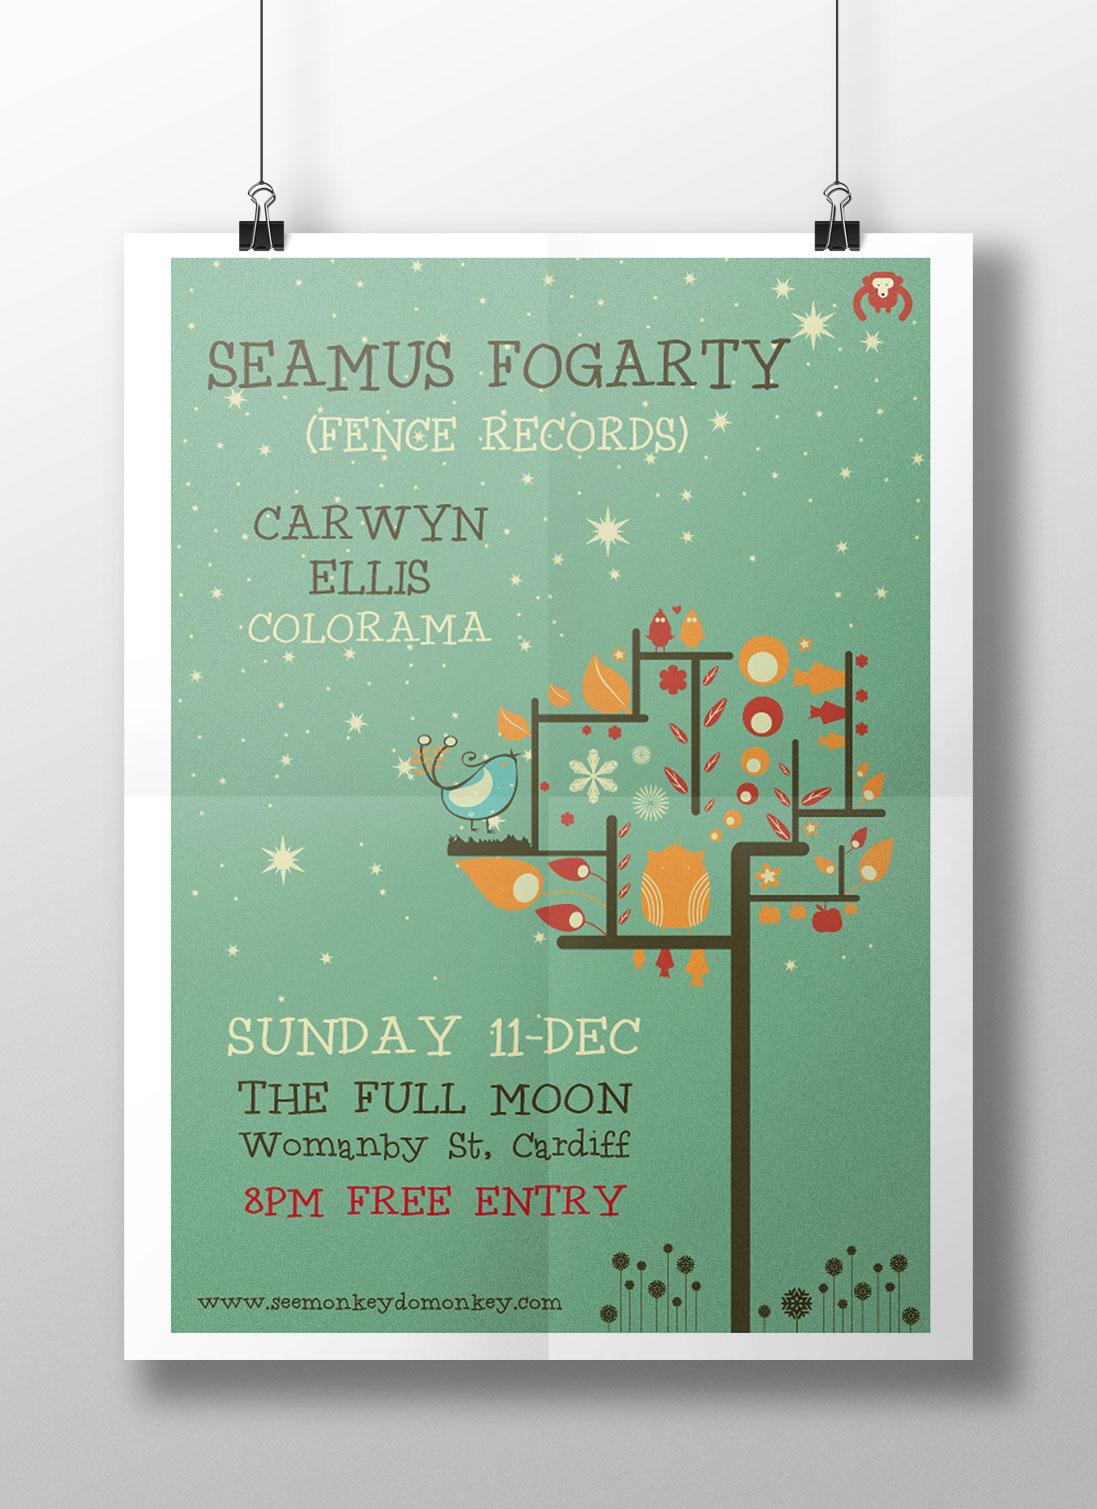 Seamus-Fogarty-Mock.jpg